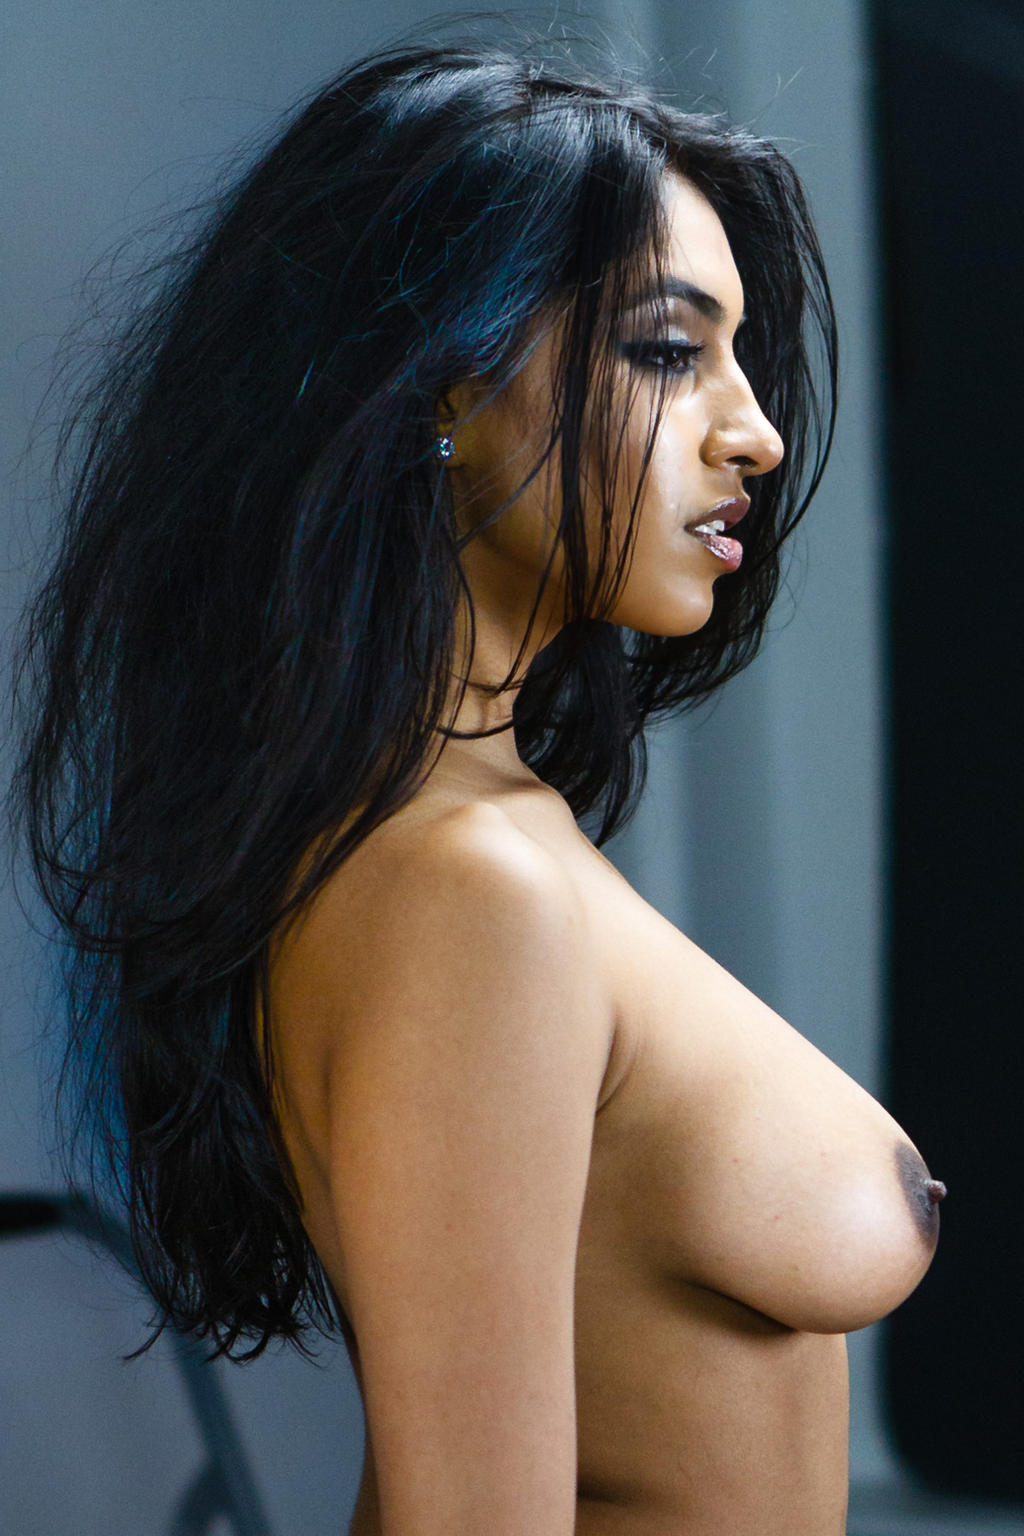 Kerala topless models bonham